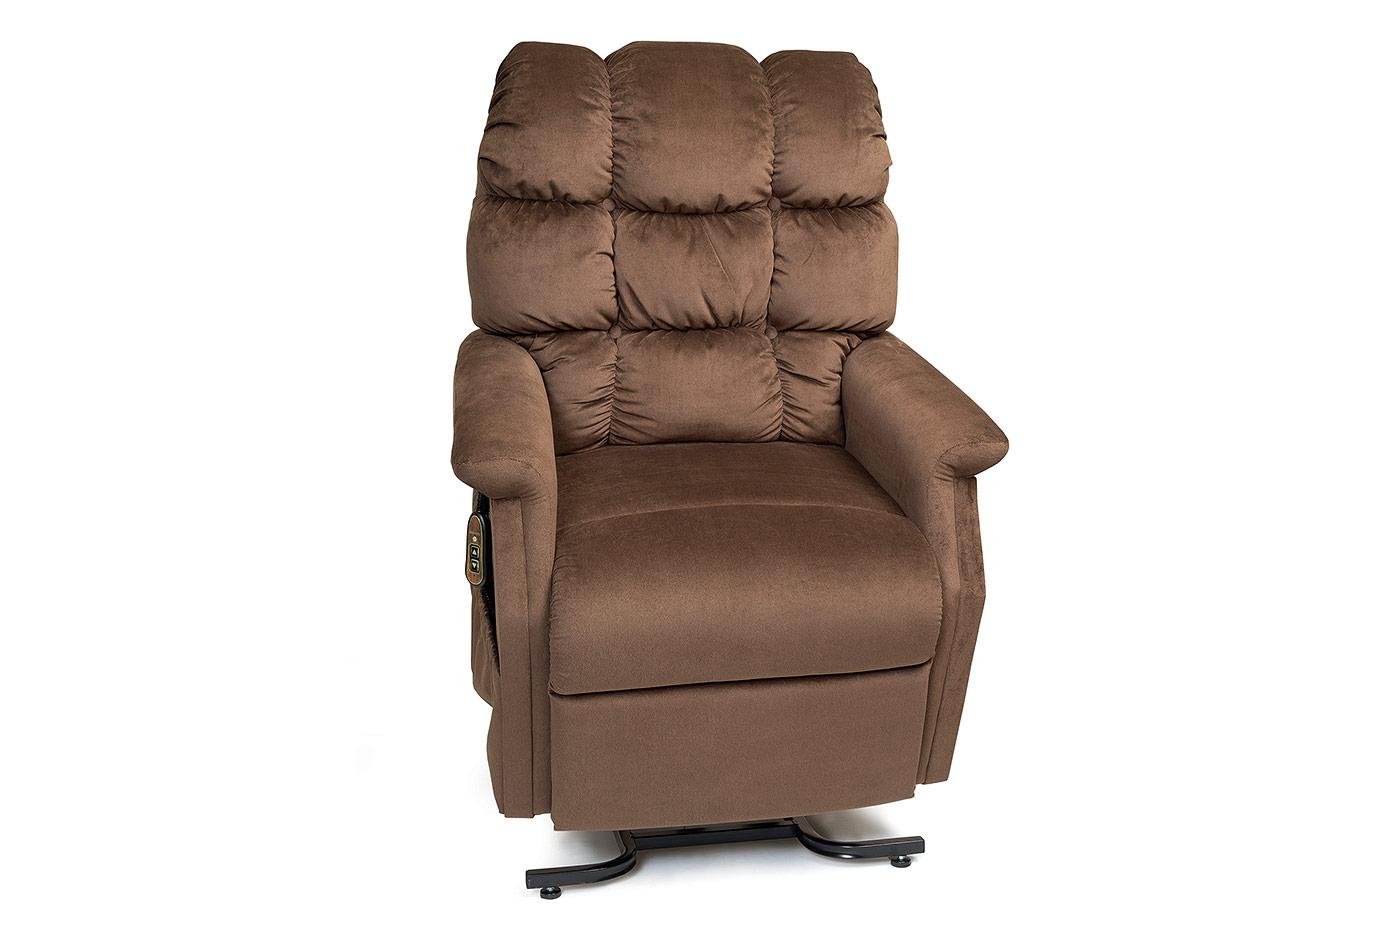 Cambridge Lift Chair Medium Large User Height 5 7 Quot 6 4